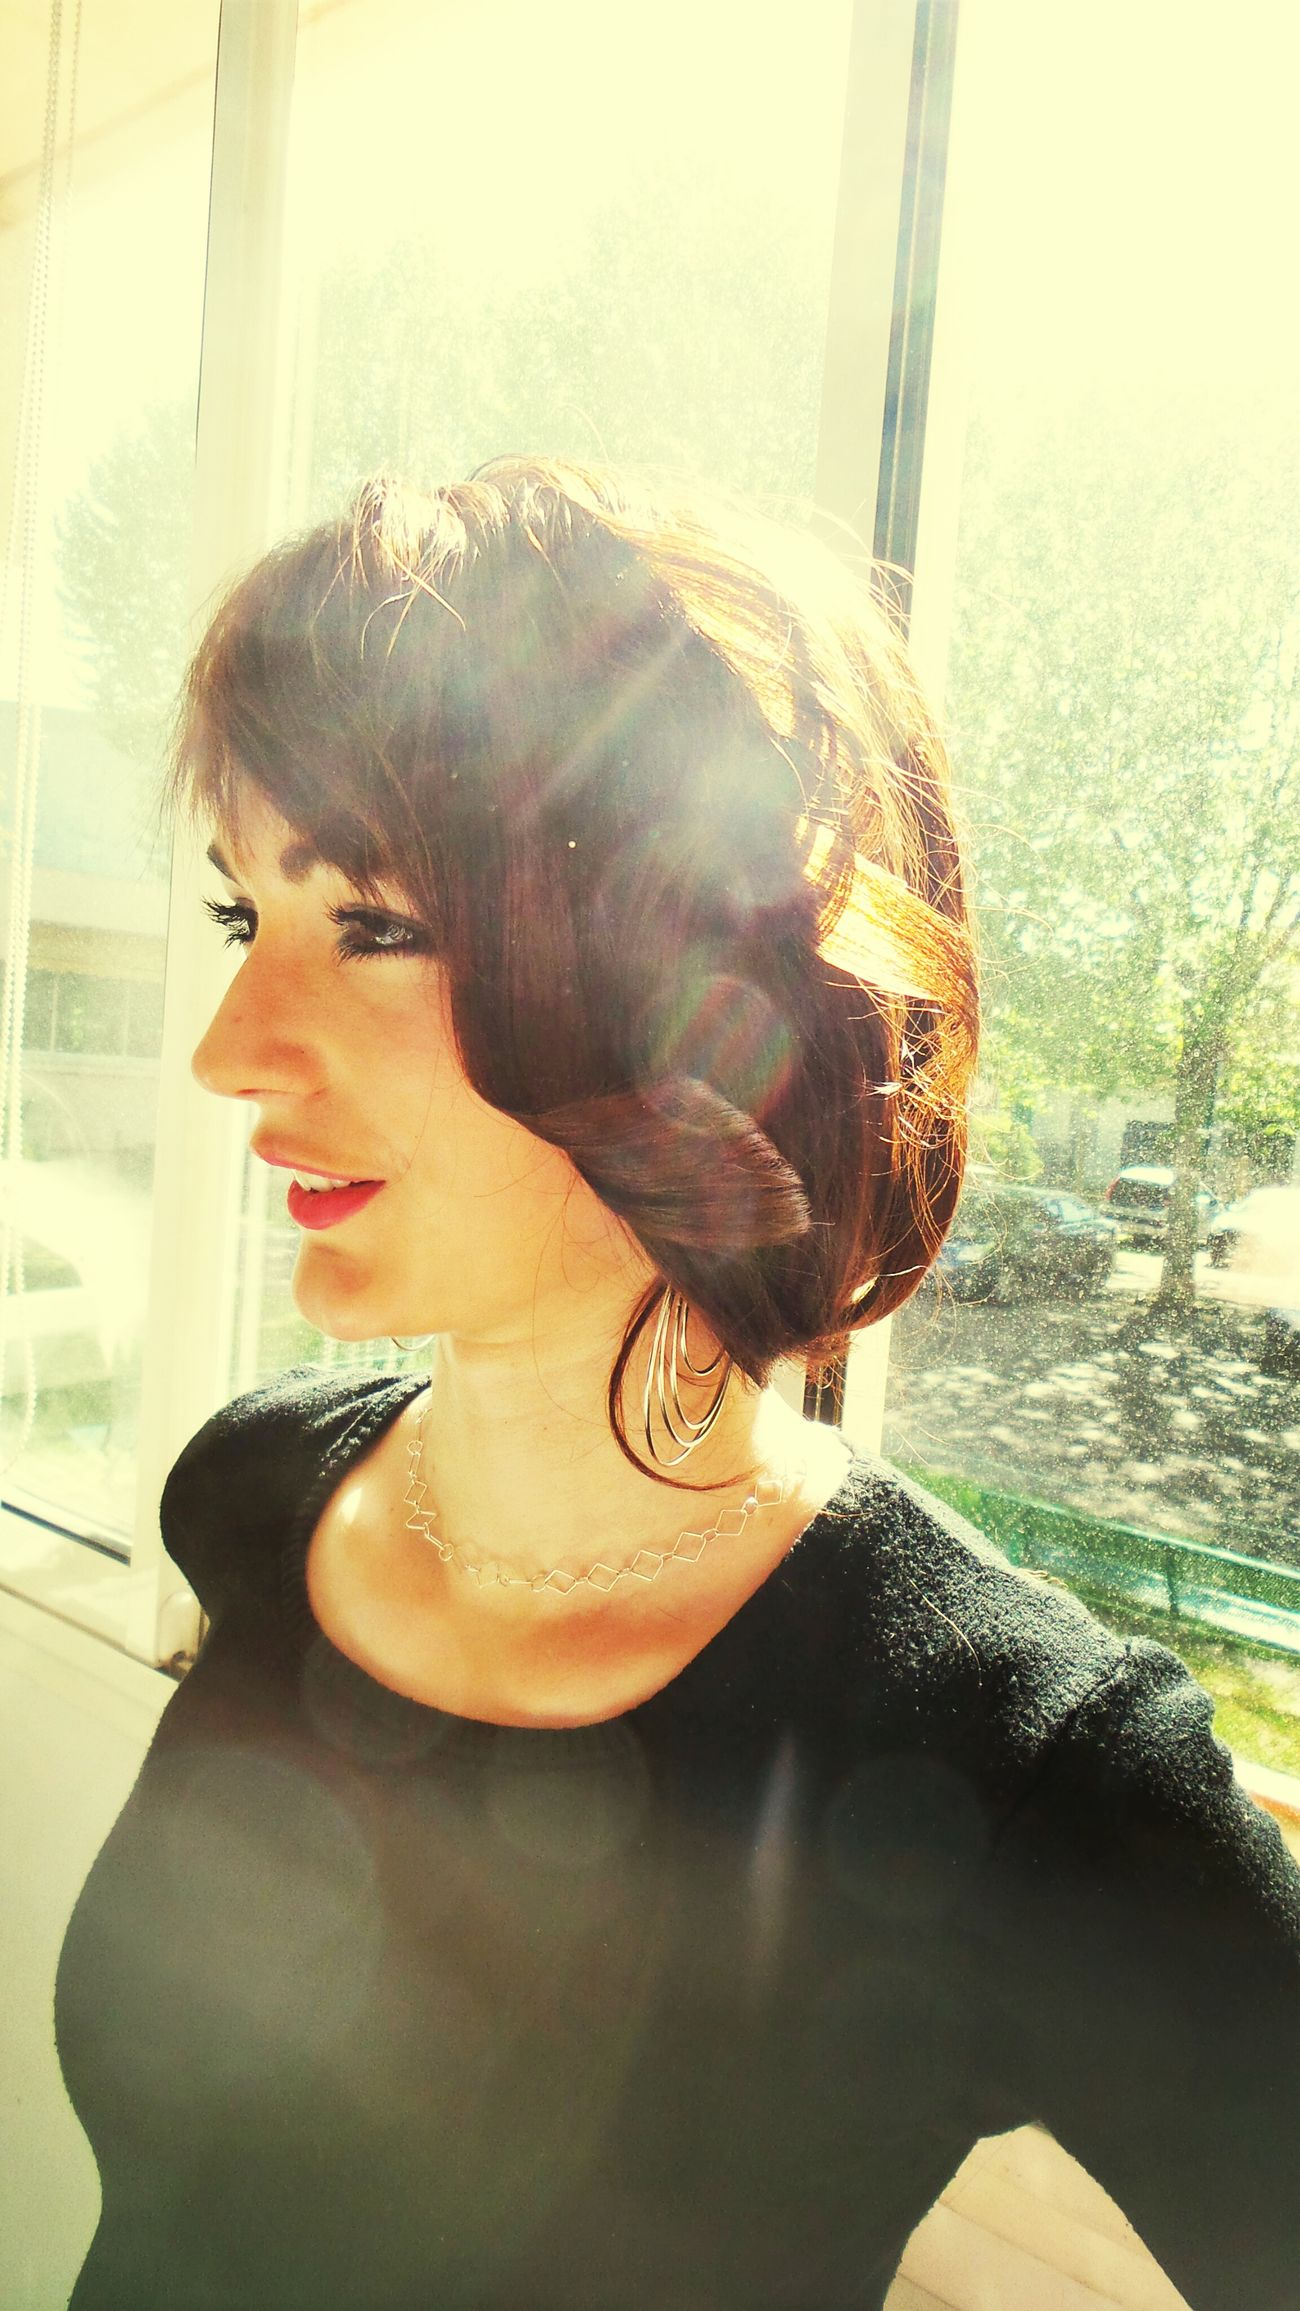 Beauty Model Hairdressing Creation The Portraitist - 2015 EyeEm Awards